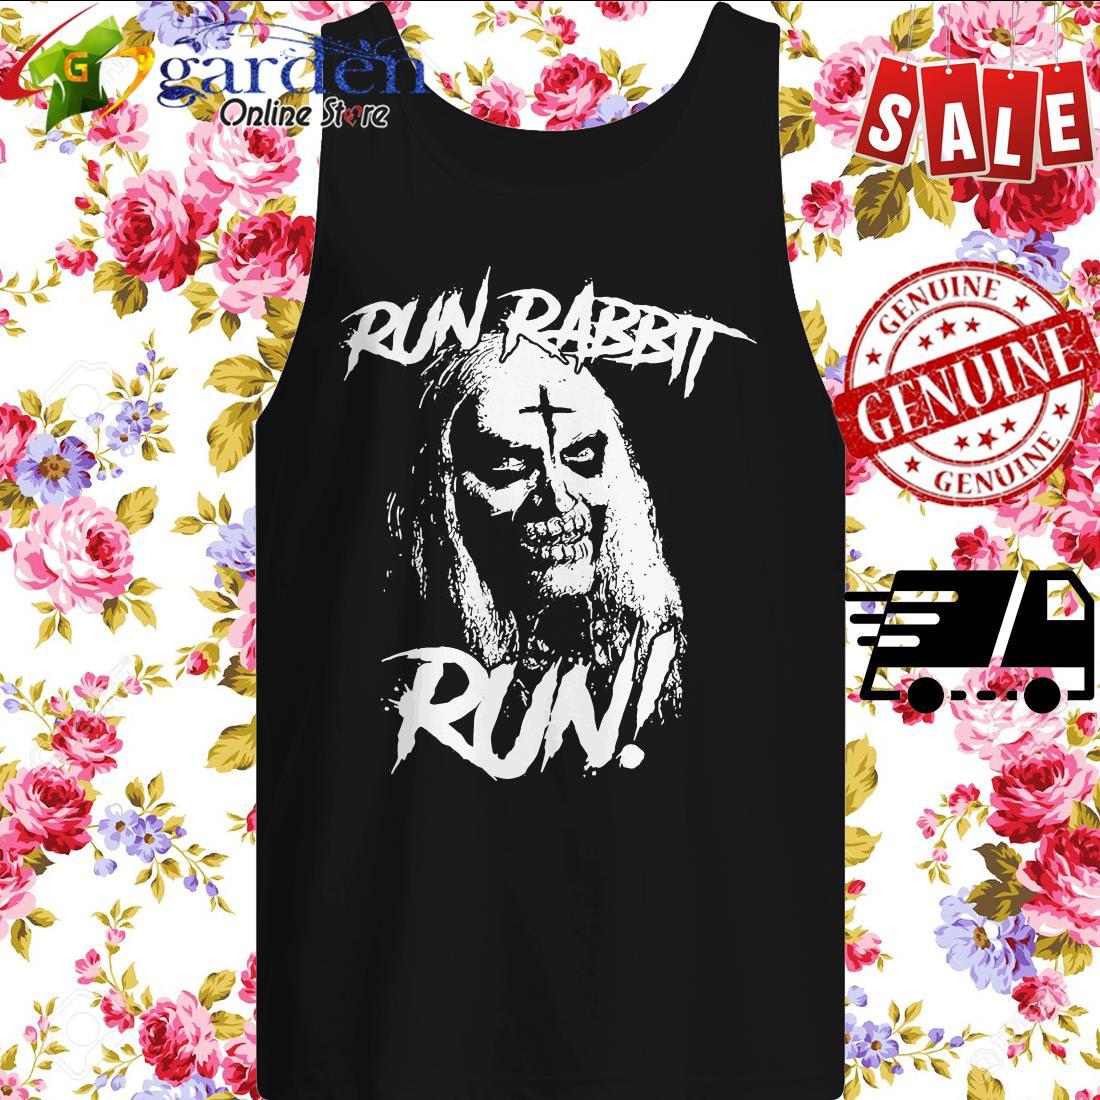 Otis B. Driftwood Run Rabbit Run tank top